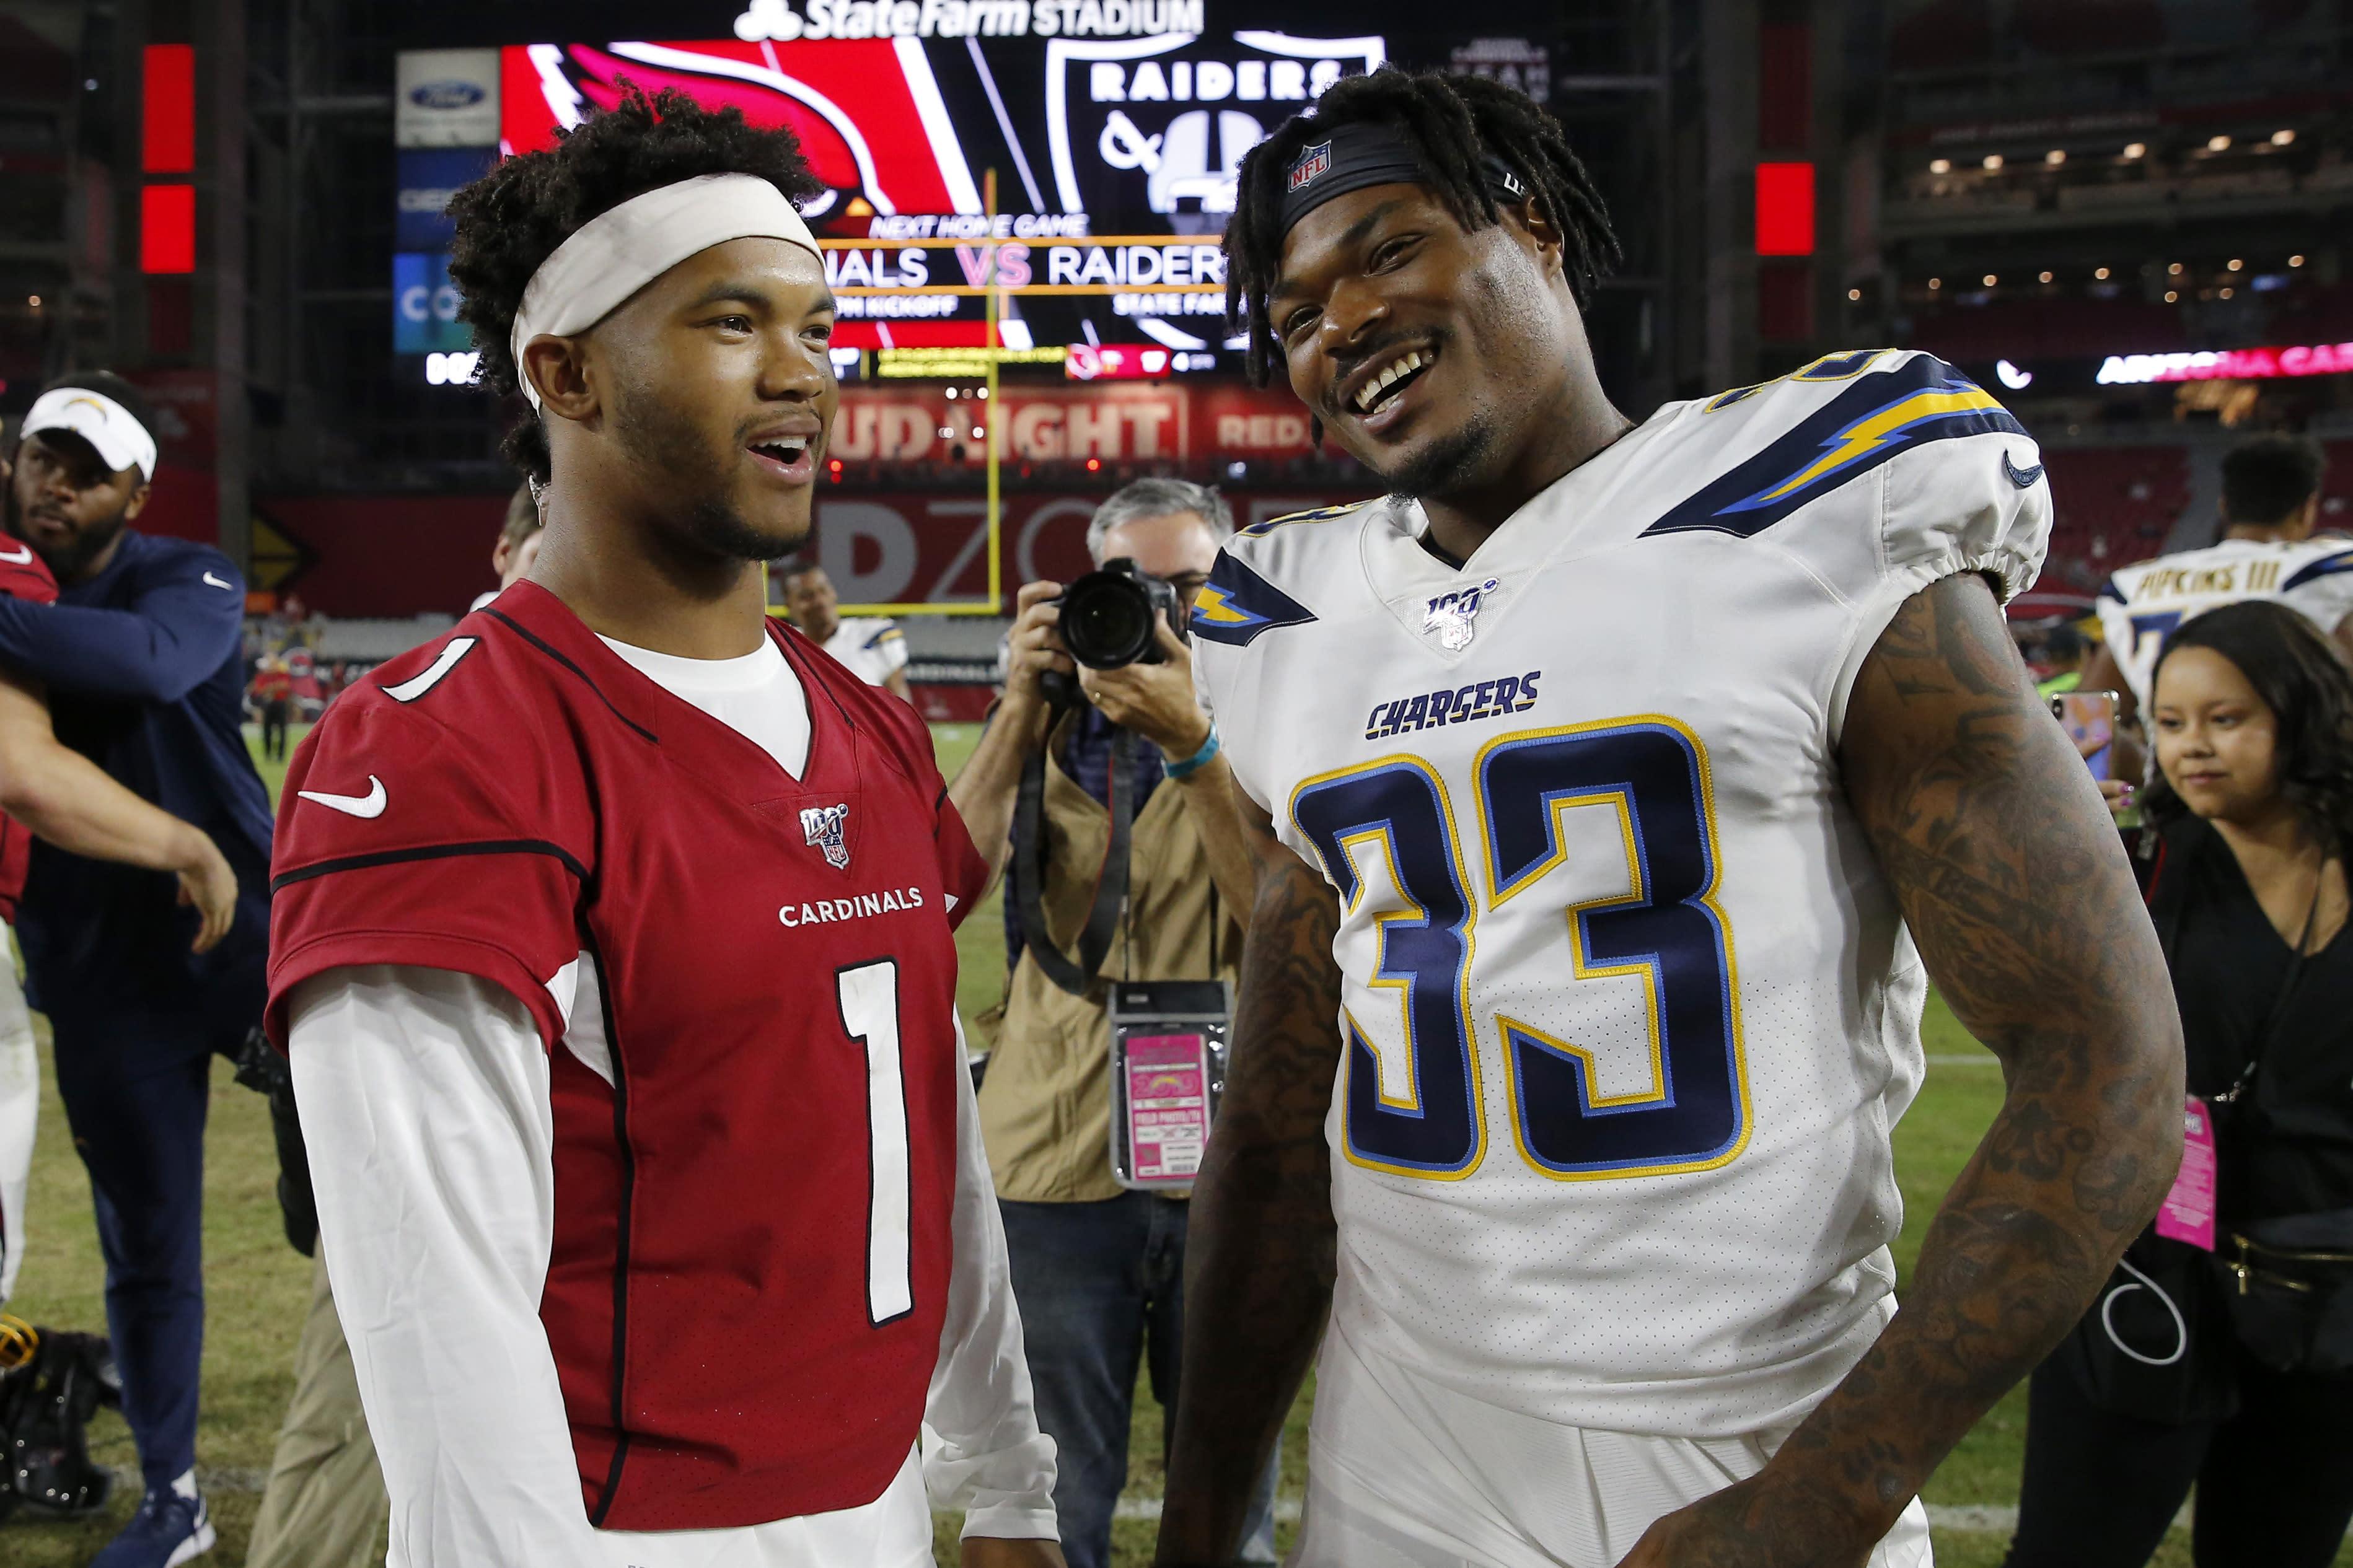 Arizona Cardinals quarterback Kyler Murray (1) greets Los Angeles Chargers free safety Derwin James (33) after an NFL preseason football game, Thursday, Aug. 8, 2019, in Glendale, Ariz. (AP Photo/Rick Scuteri)